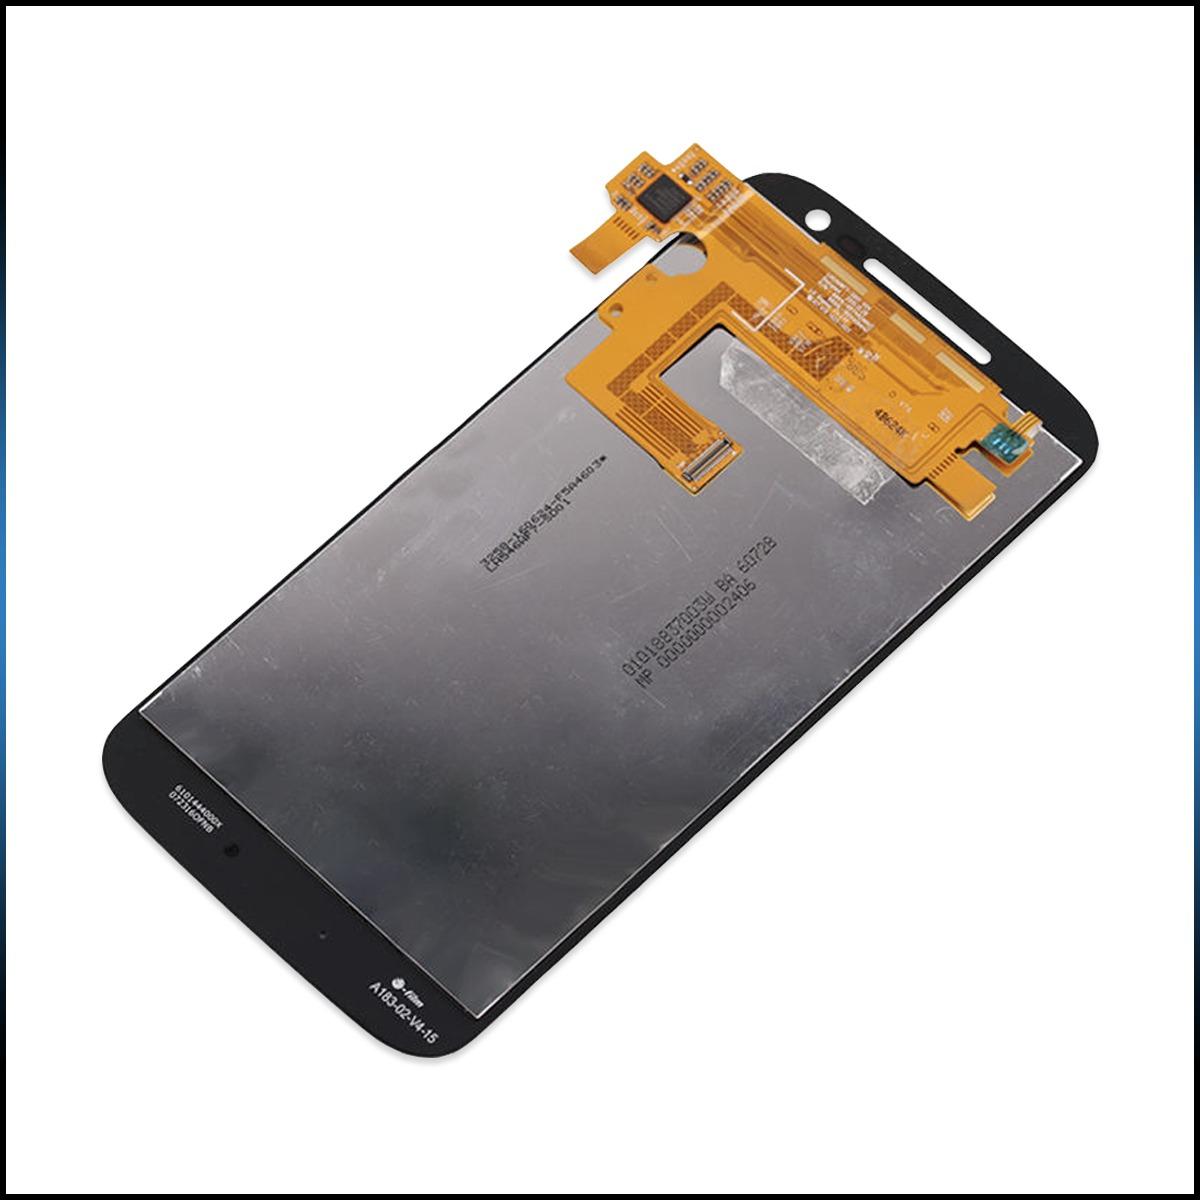 Moto G4 Display